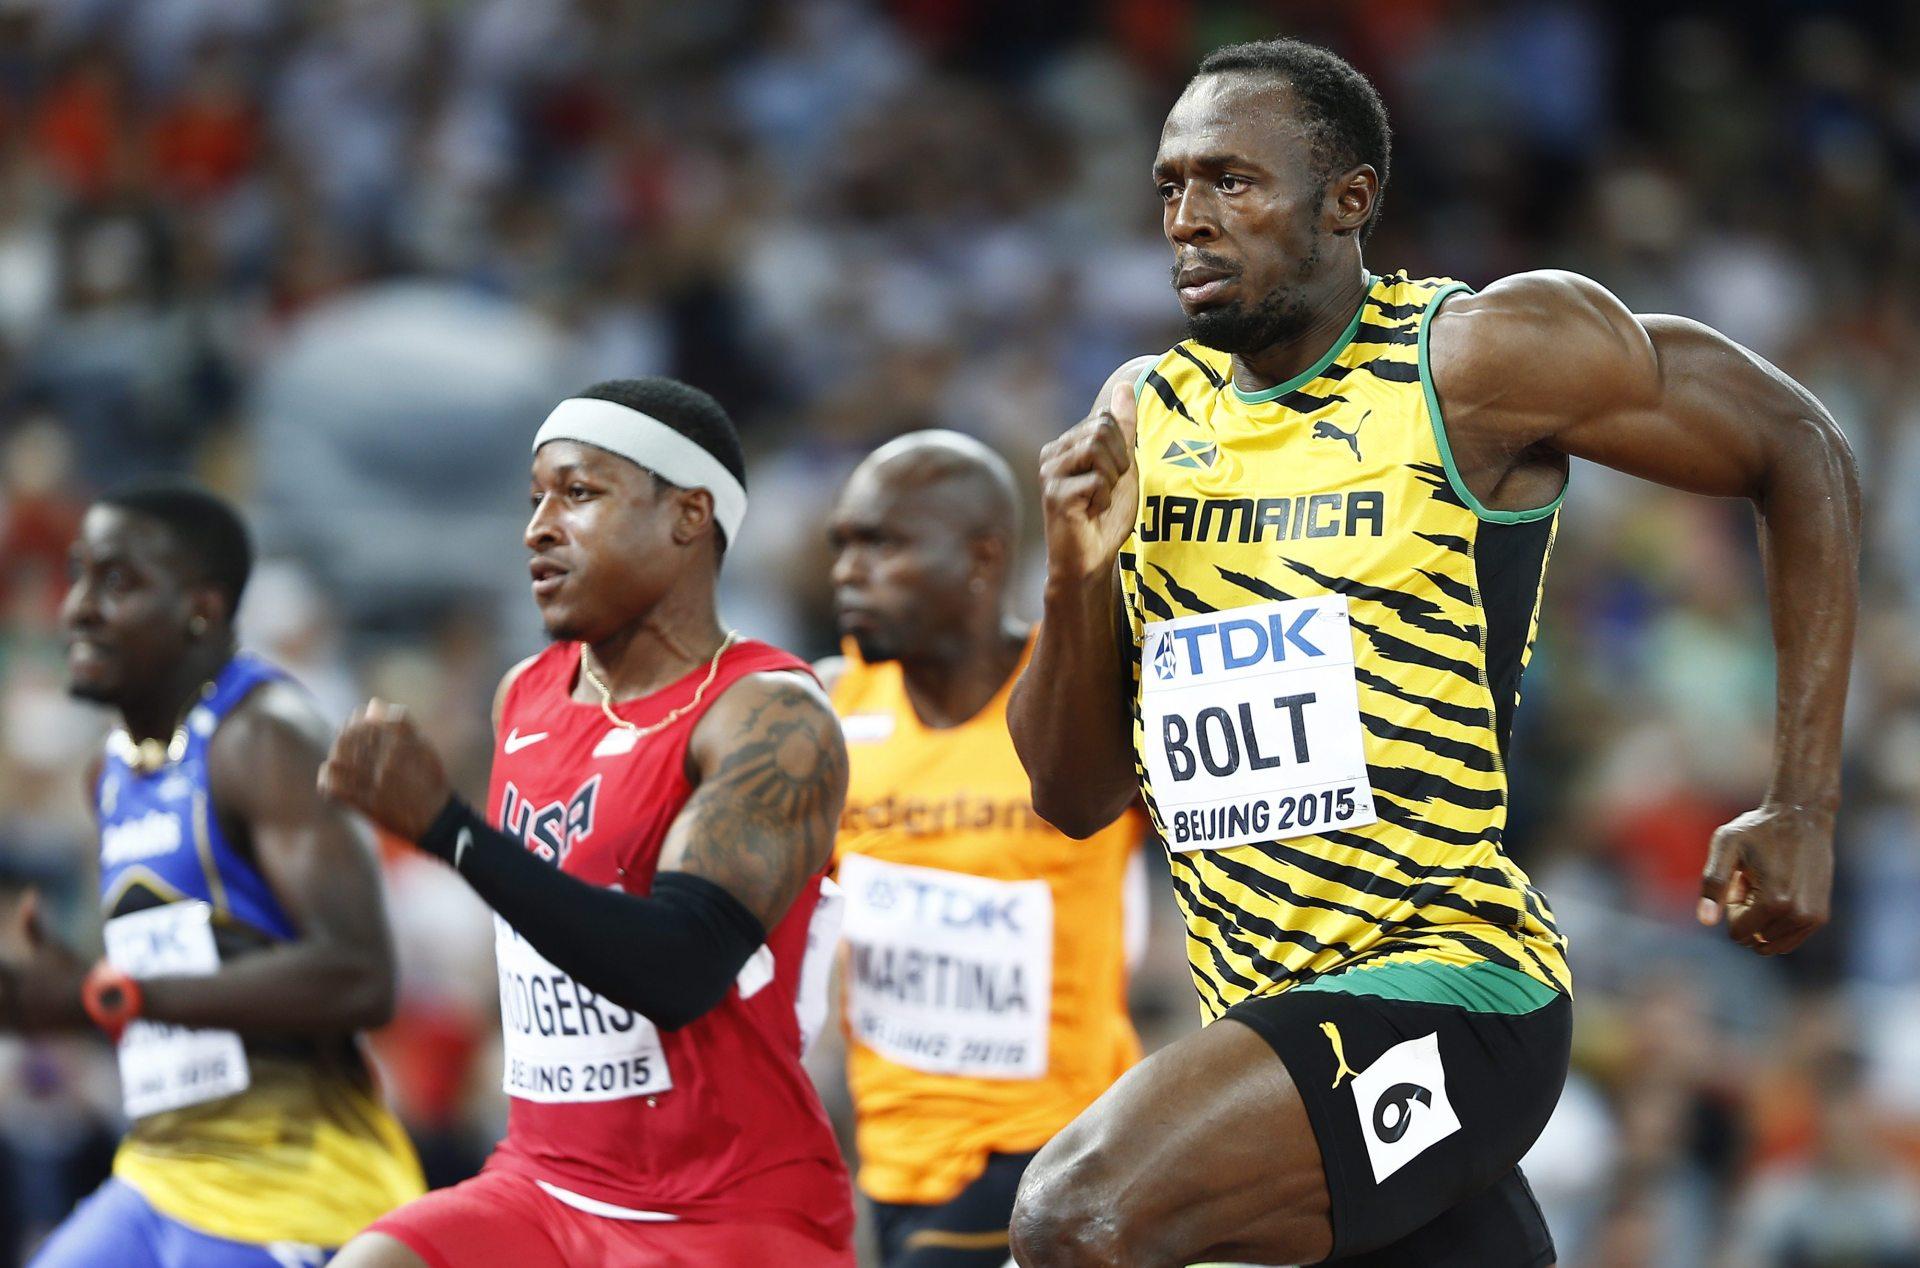 SP atletika: Gatlin brži od Bolta